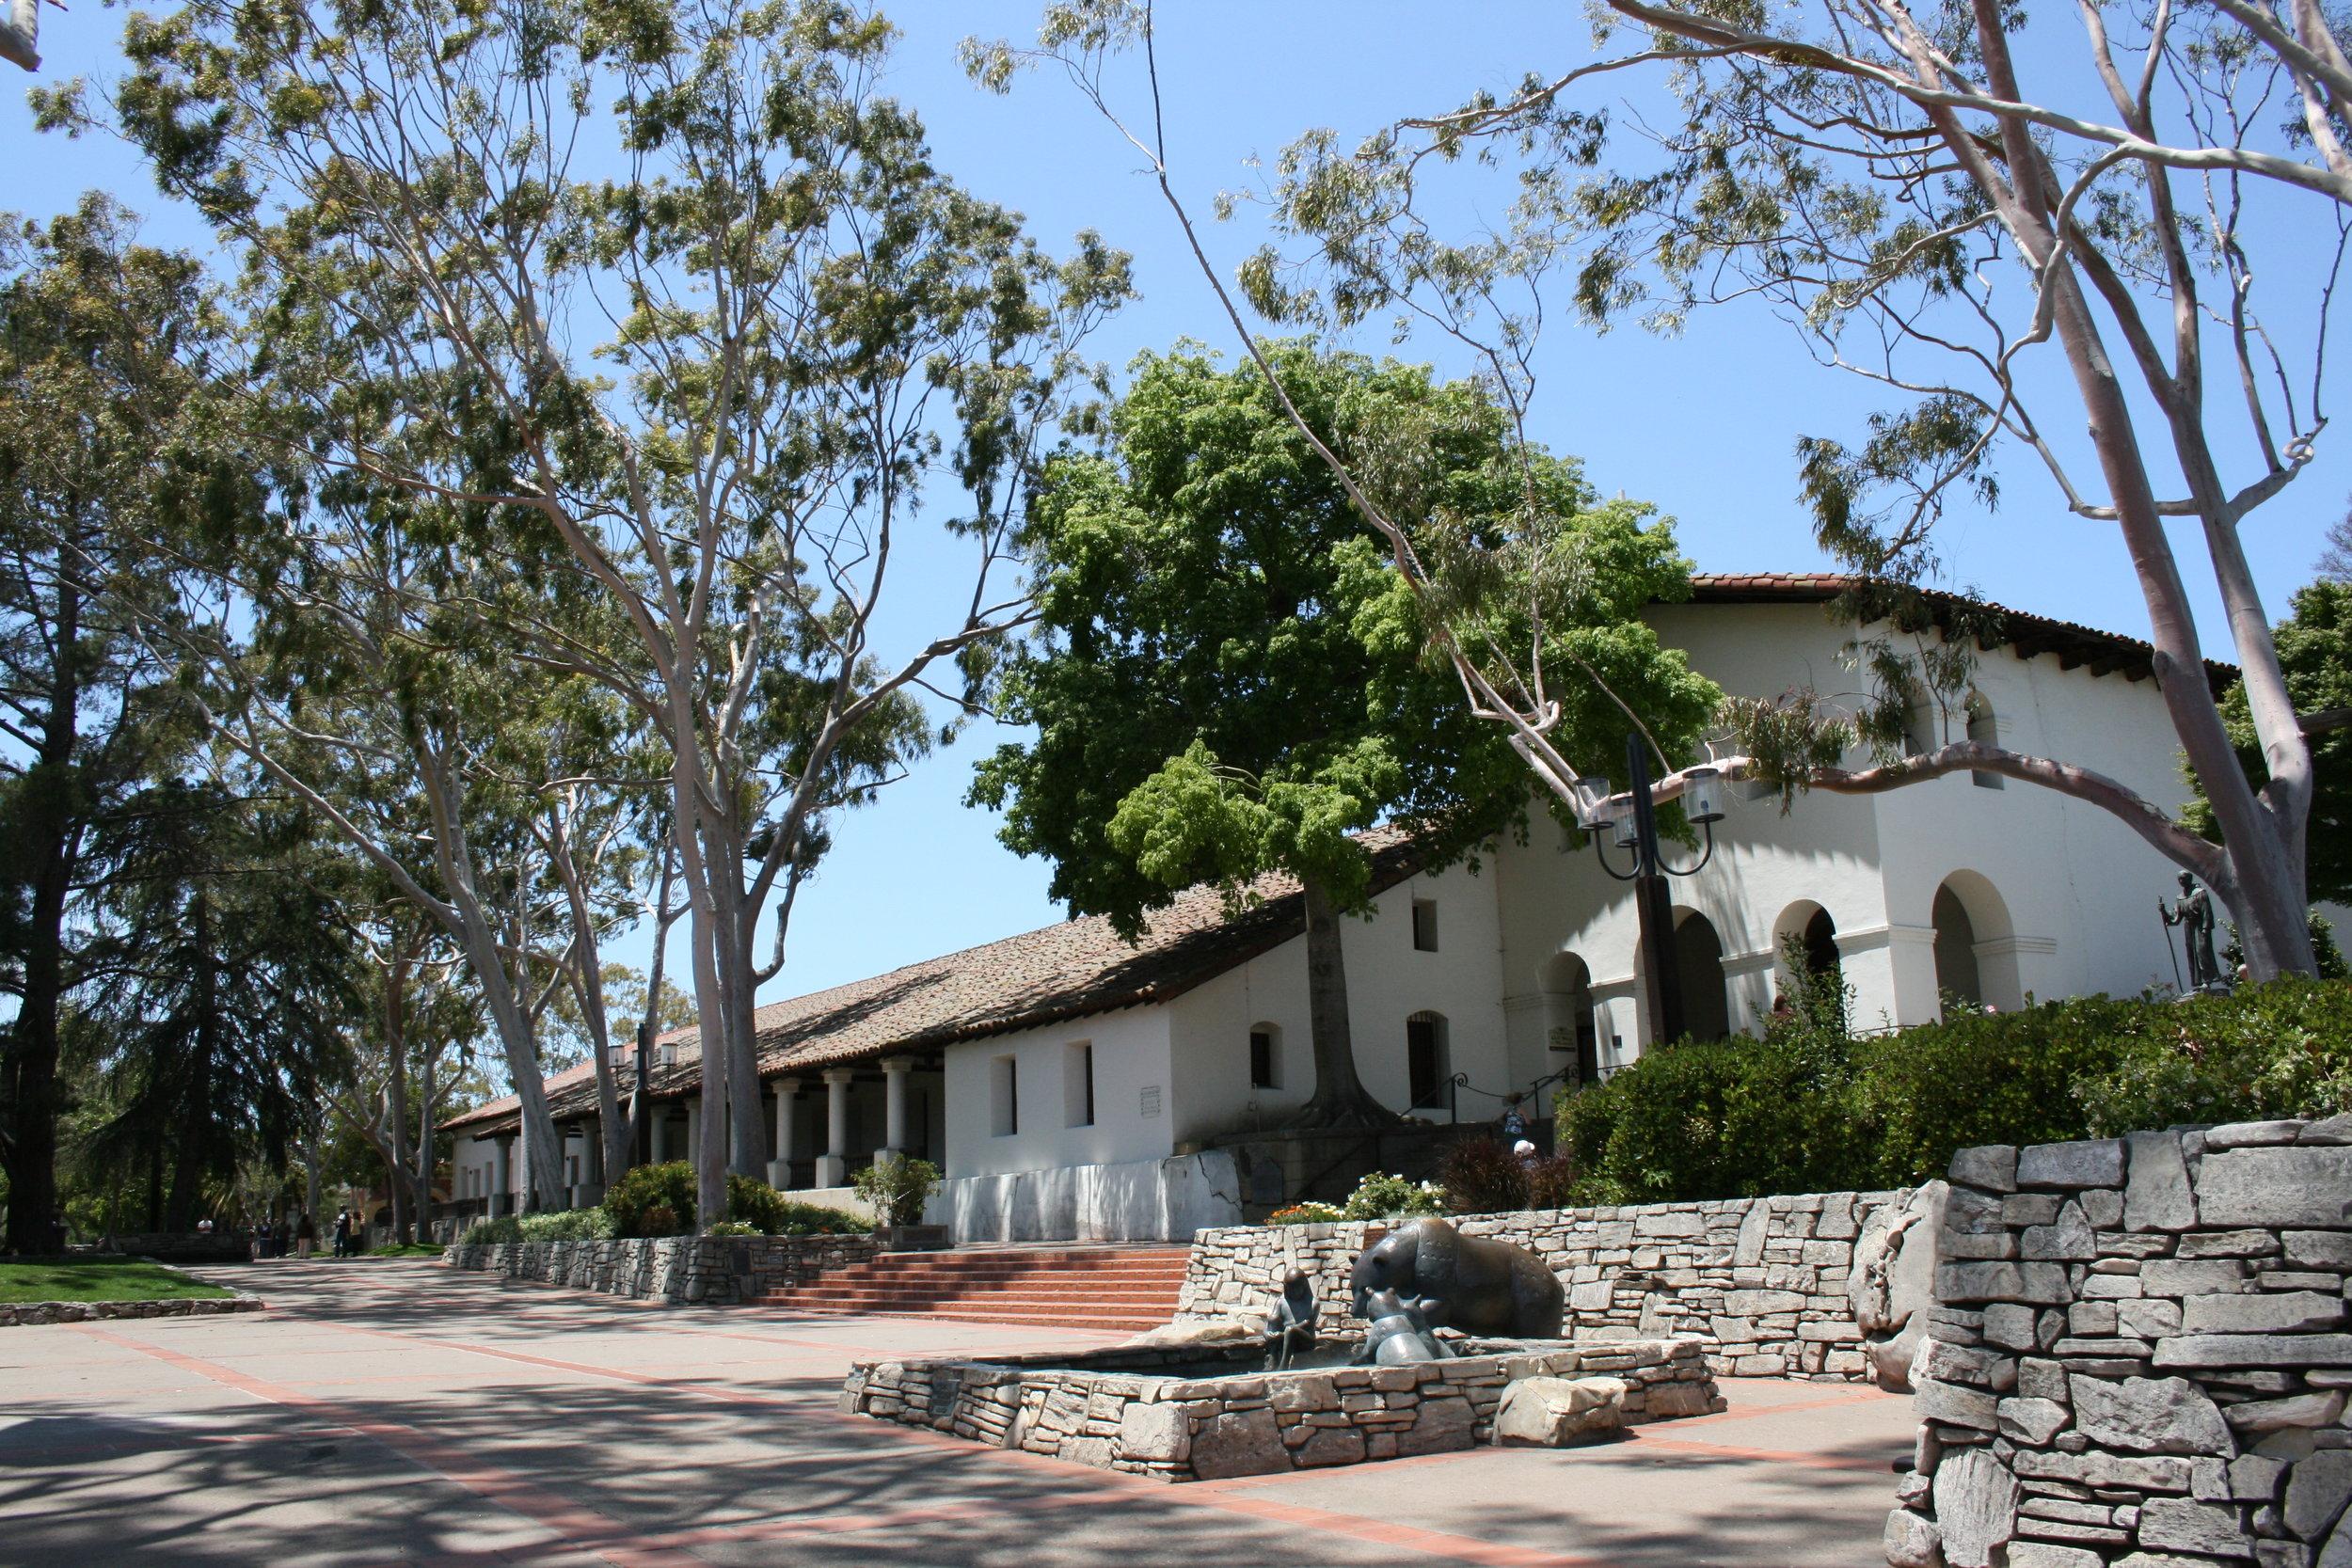 The San Luis Obispo Mission. Jill Clardy